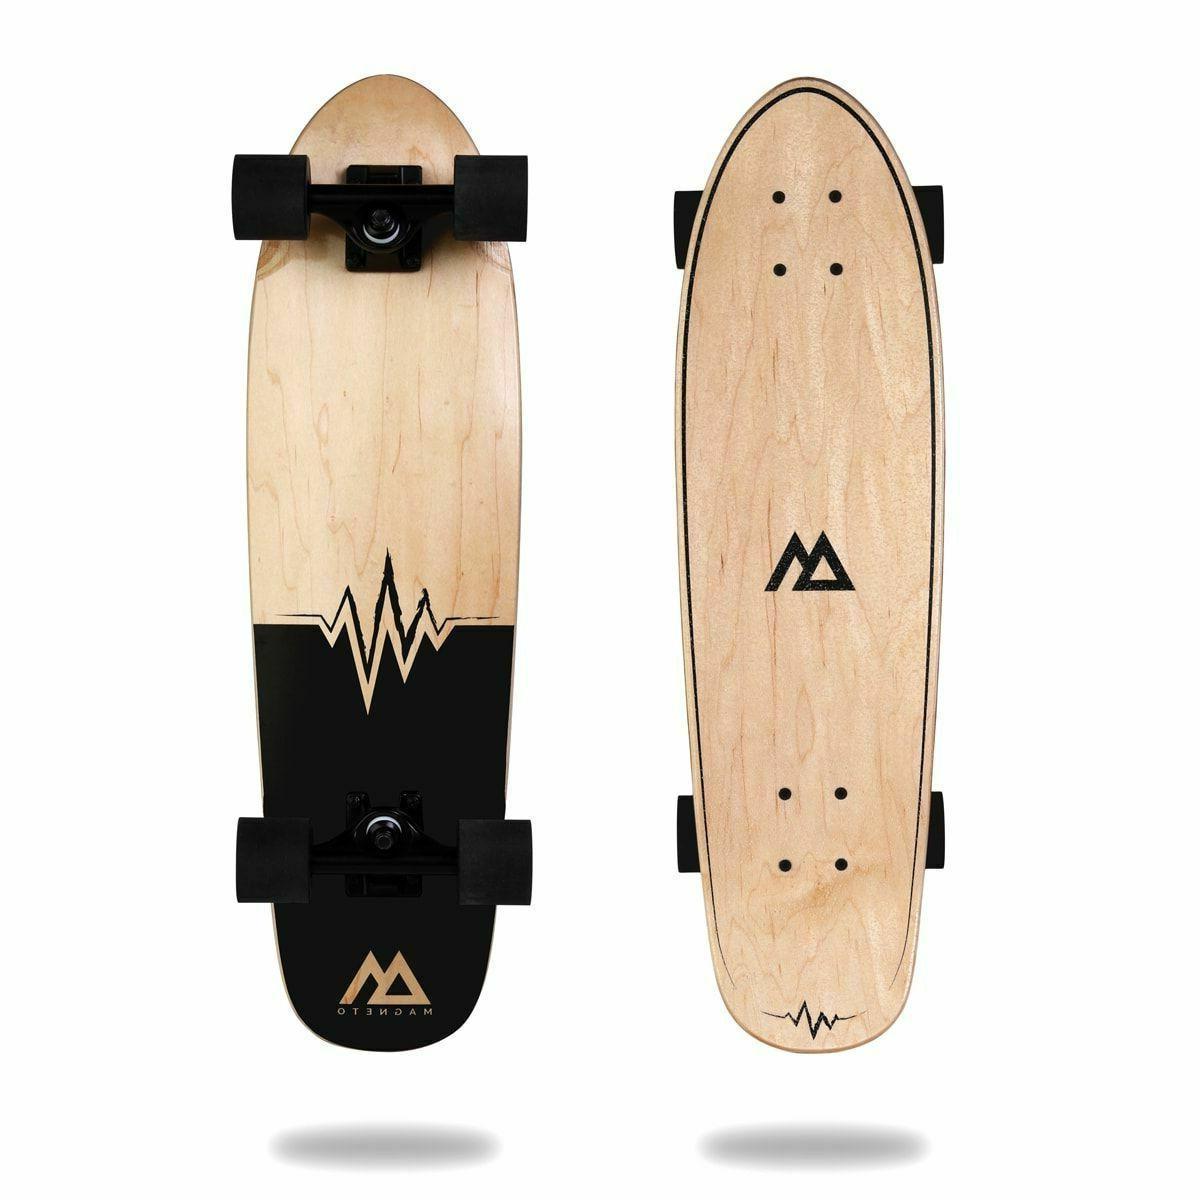 mini cruiser skateboard complete set up designed